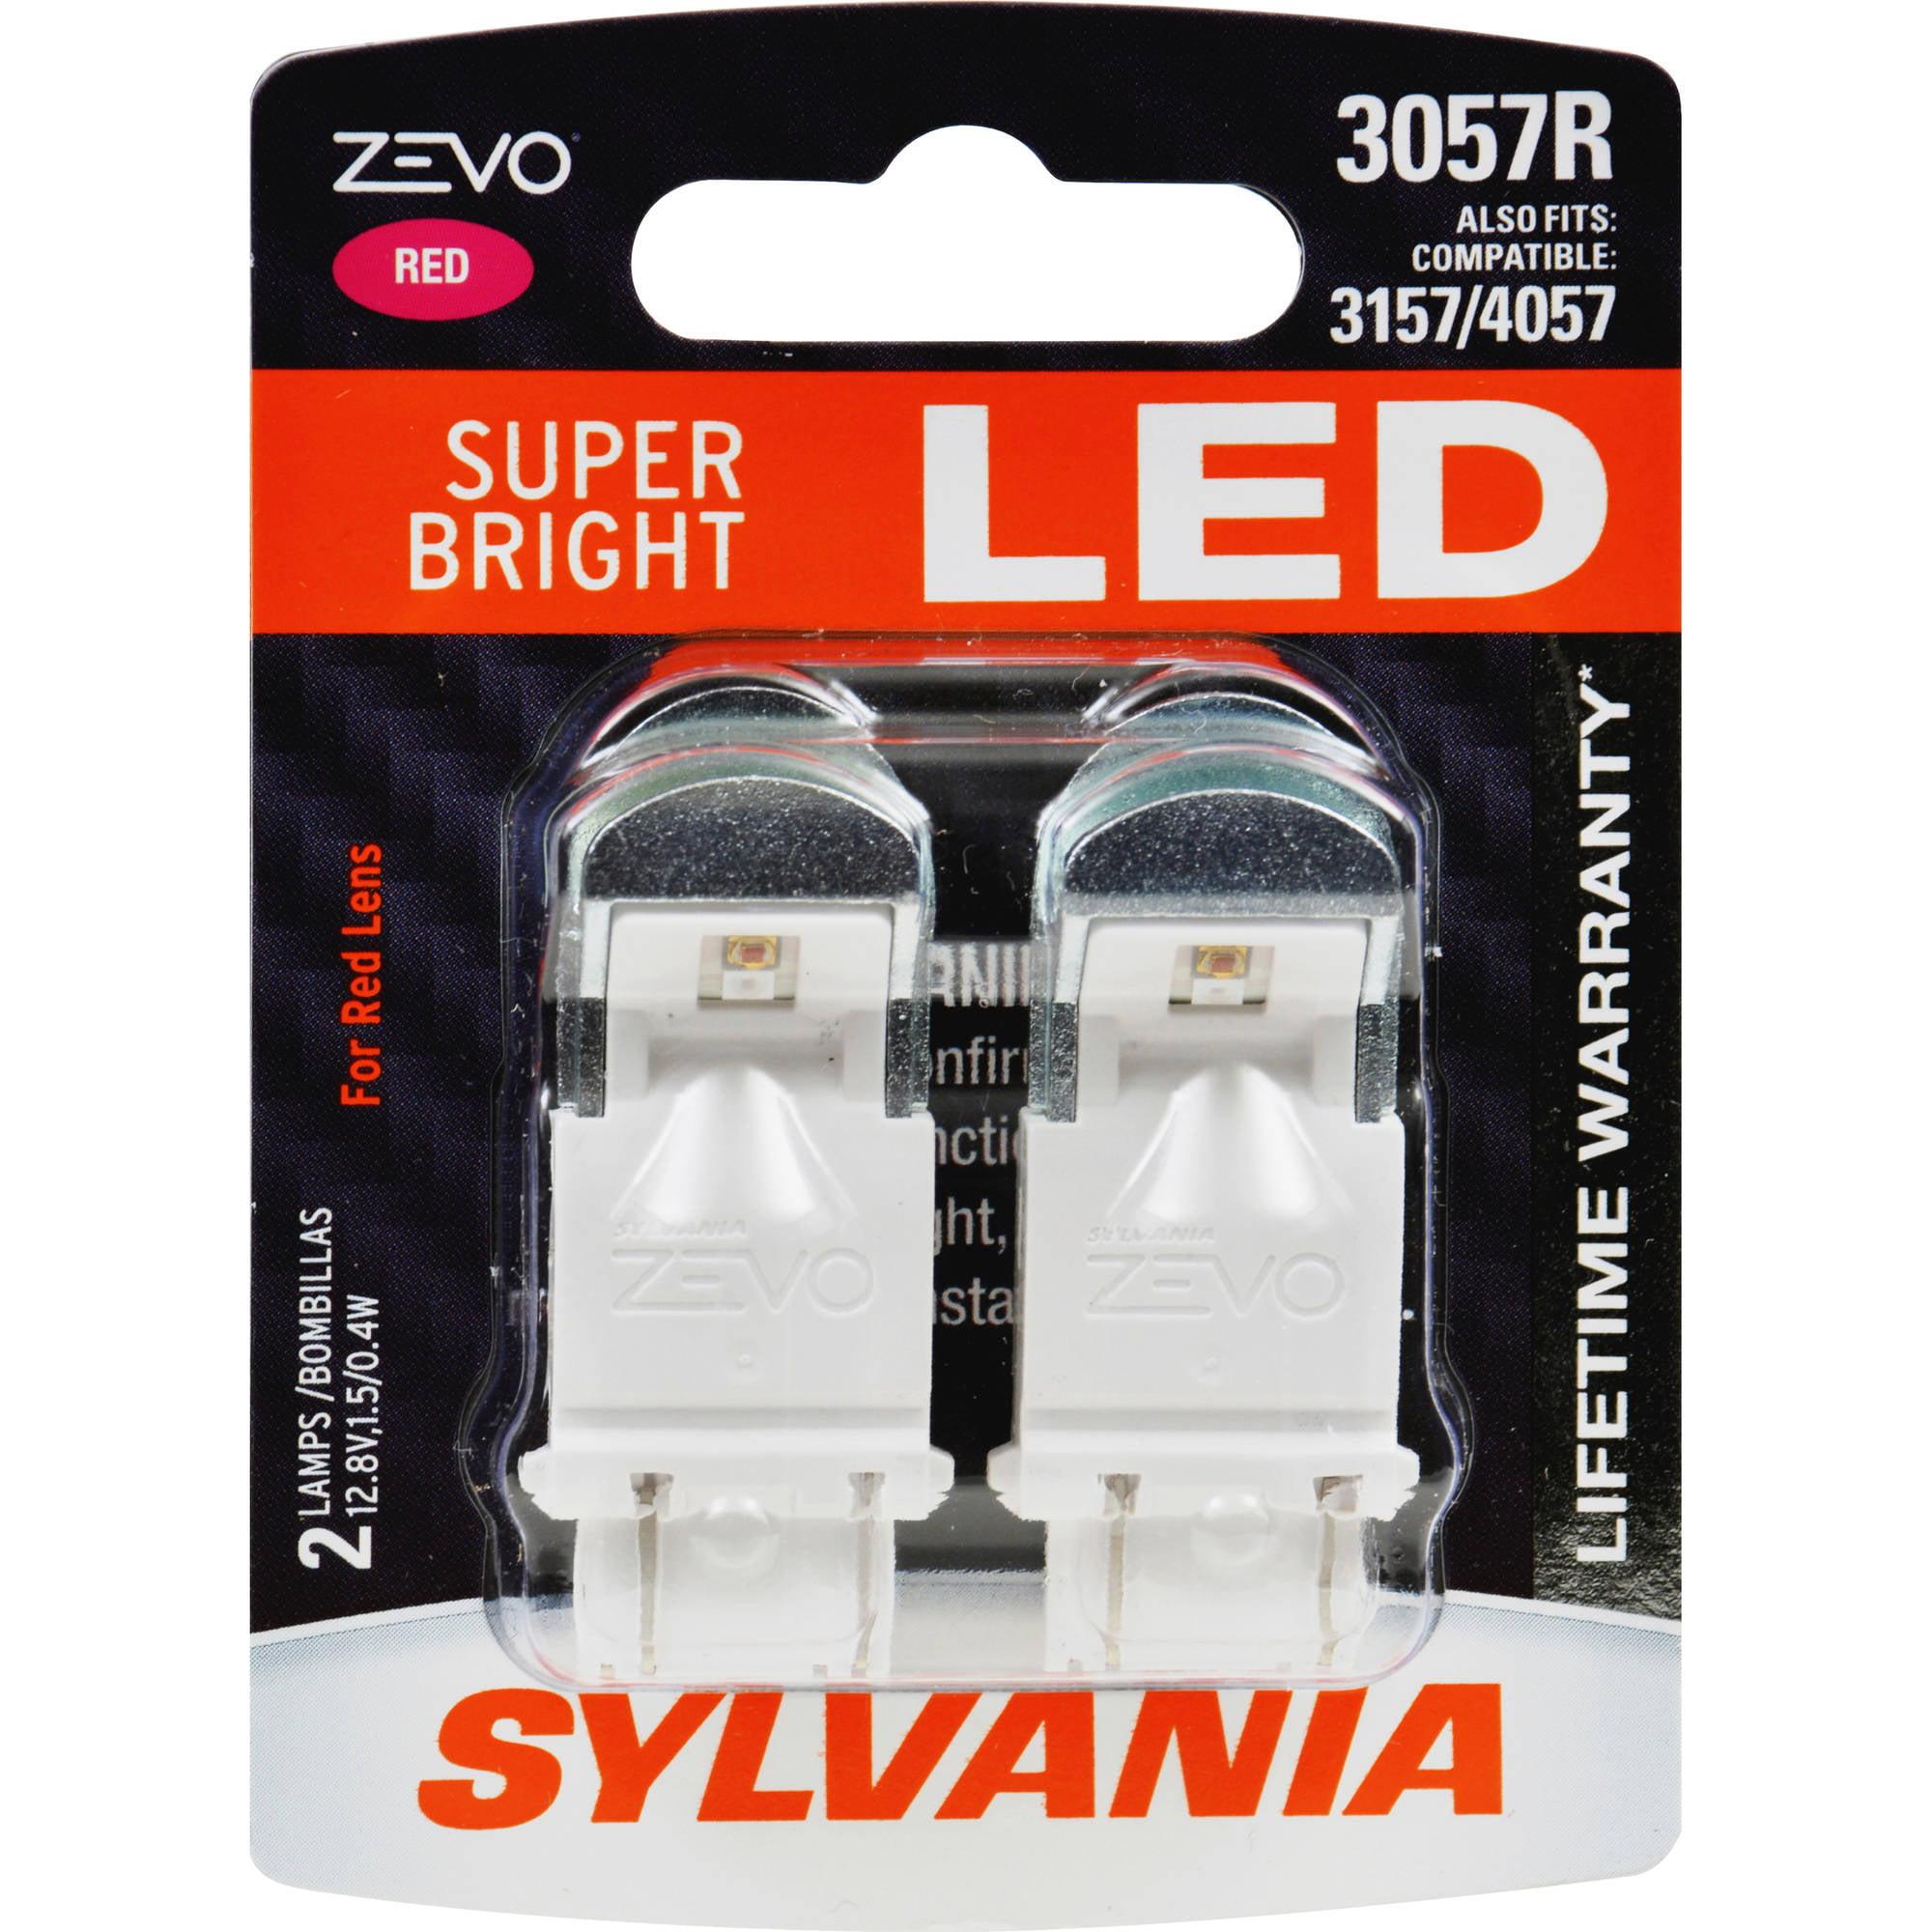 3057R ZEVO LED Bulbs, 2-Pack